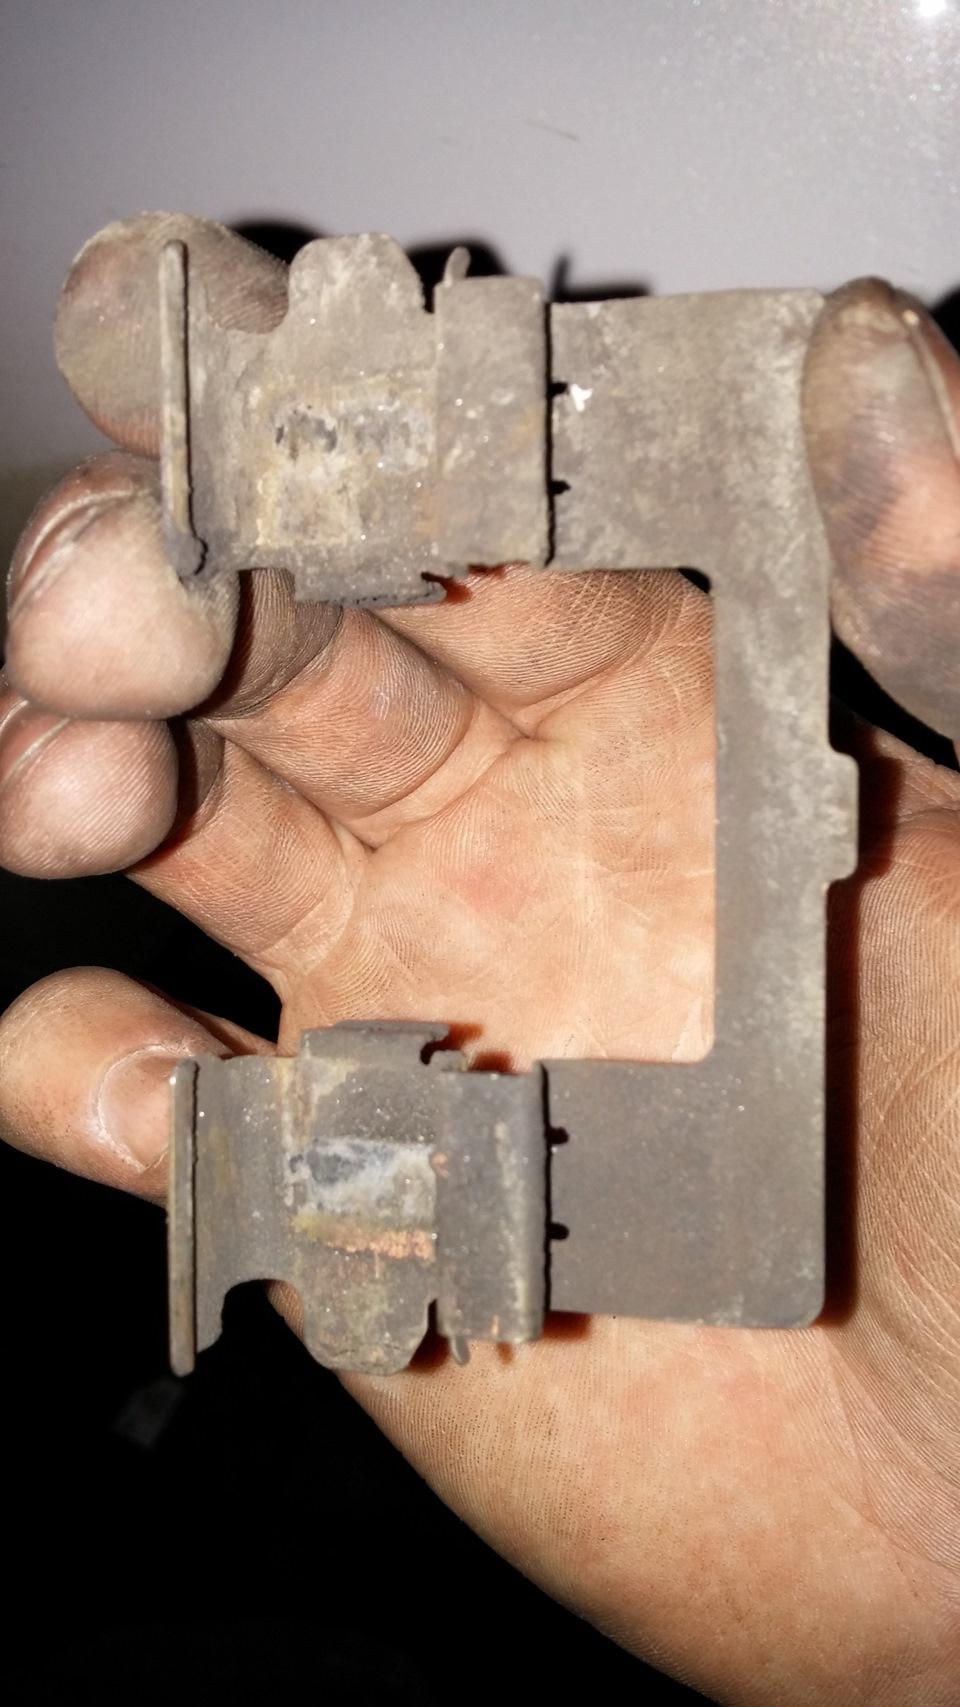 Замена тормозных колодок на мазда сх 5